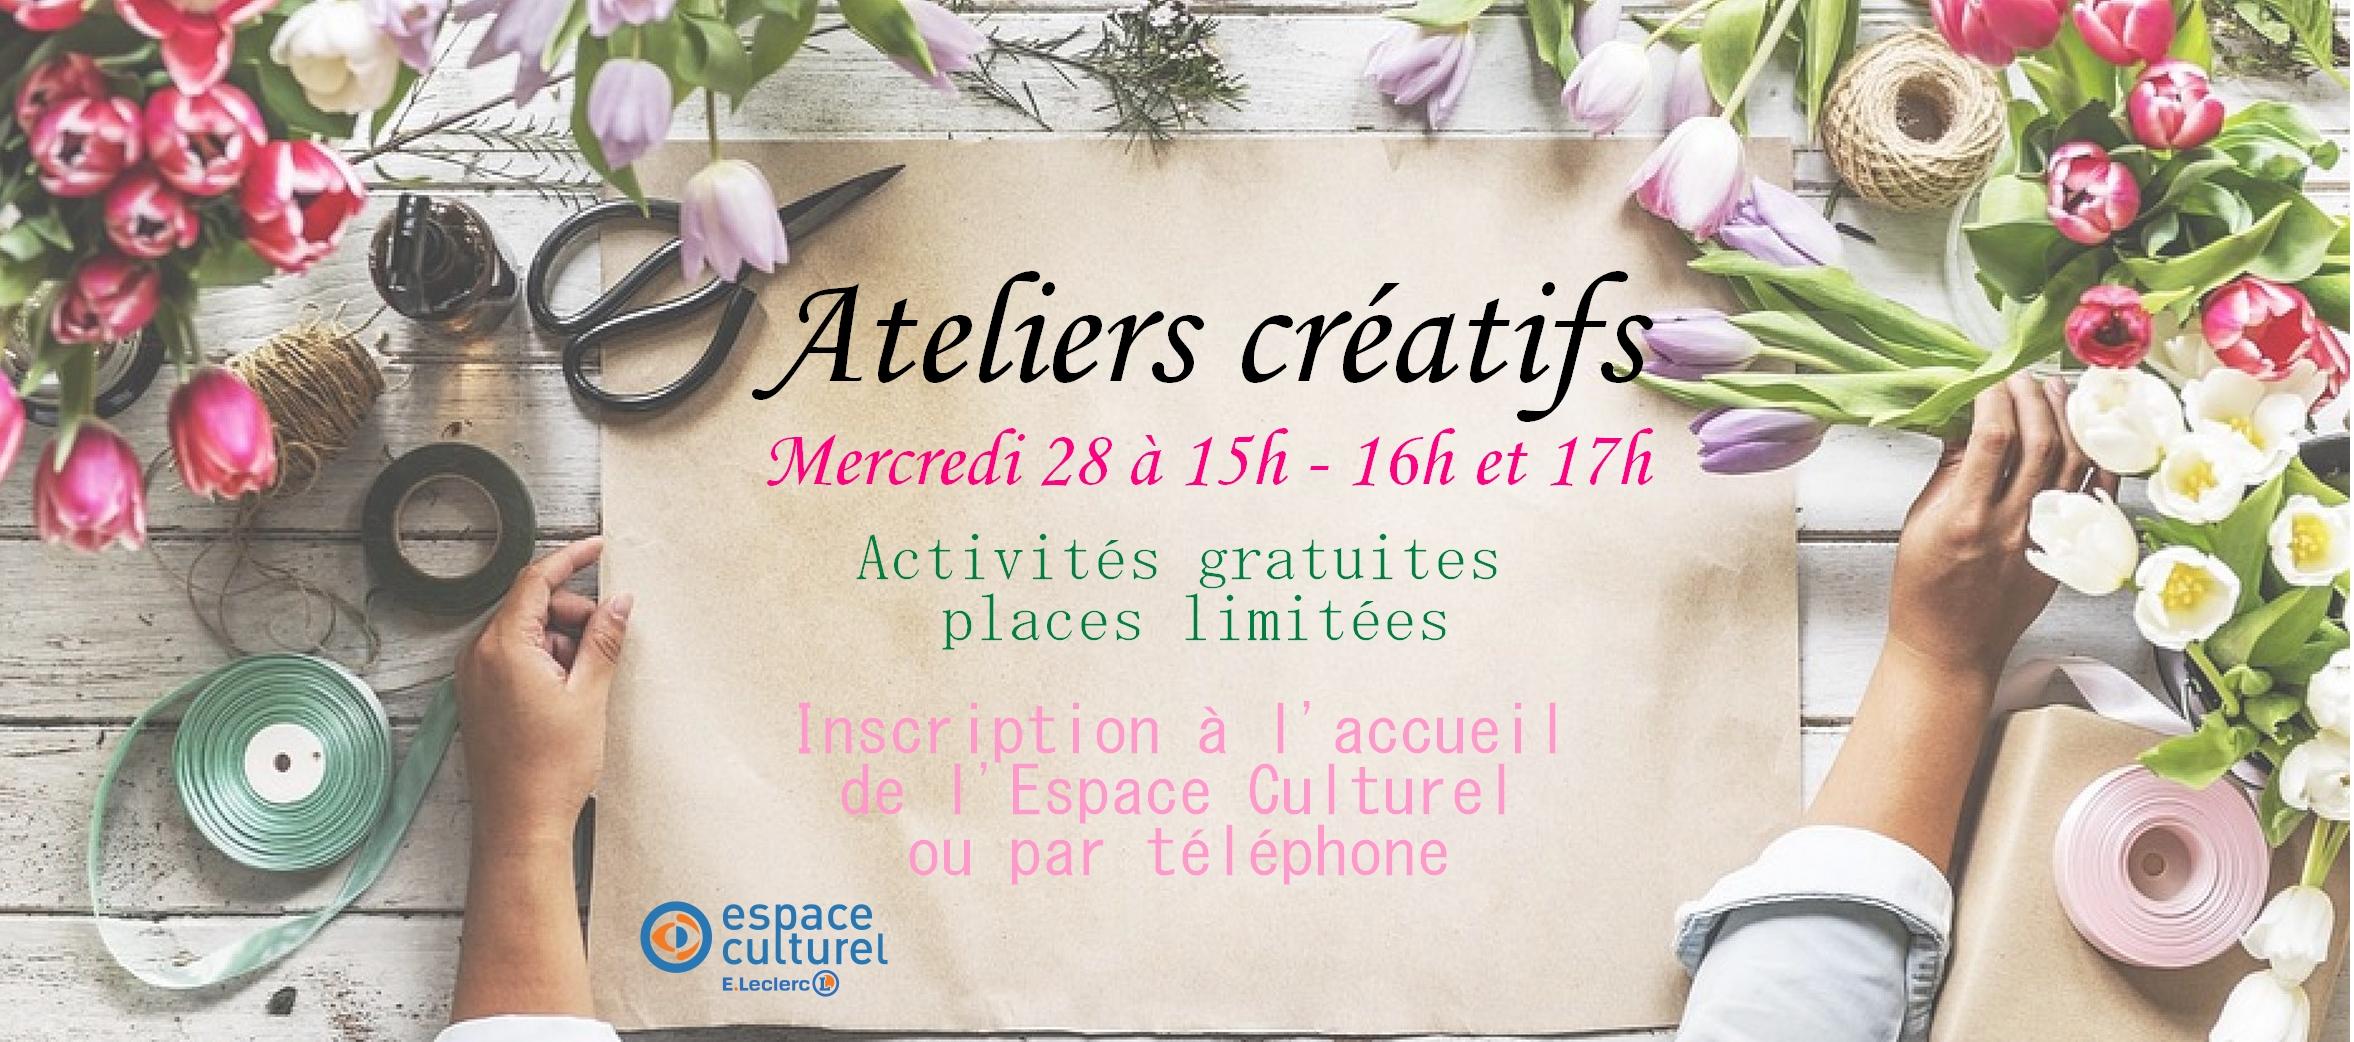 Ateliers+cr%c3%a9atifs+2